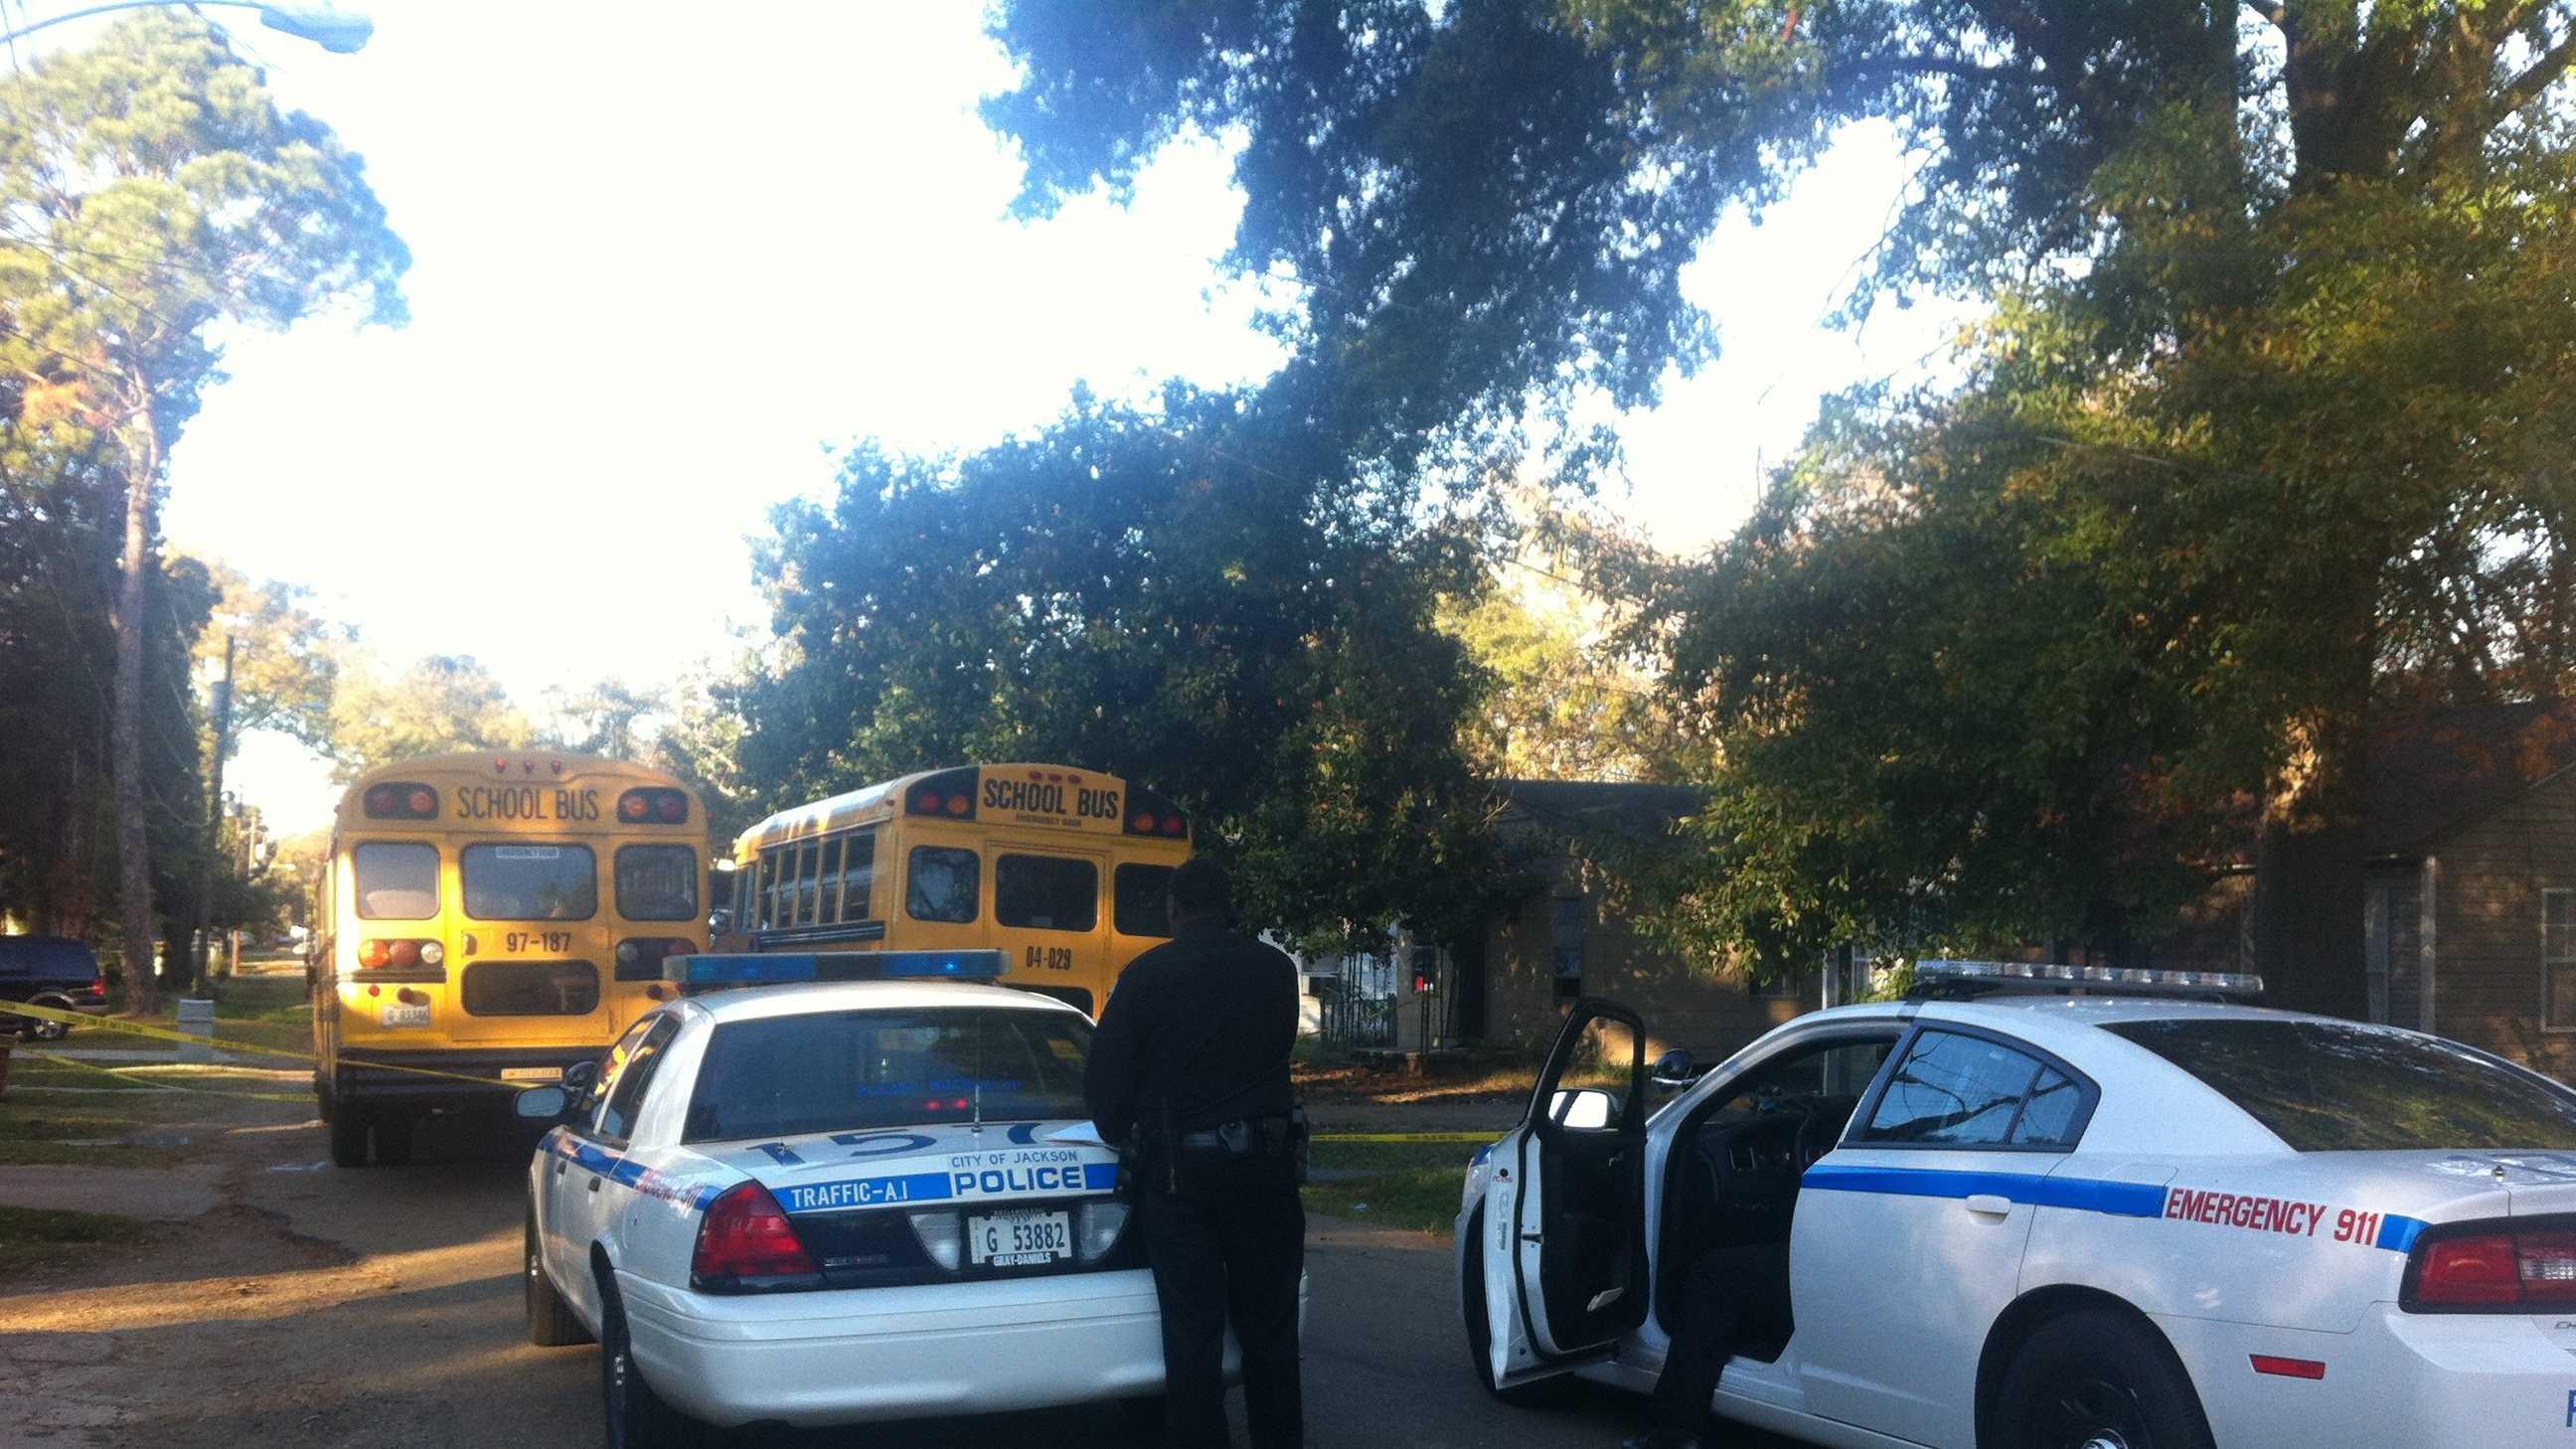 Child hit by school bus